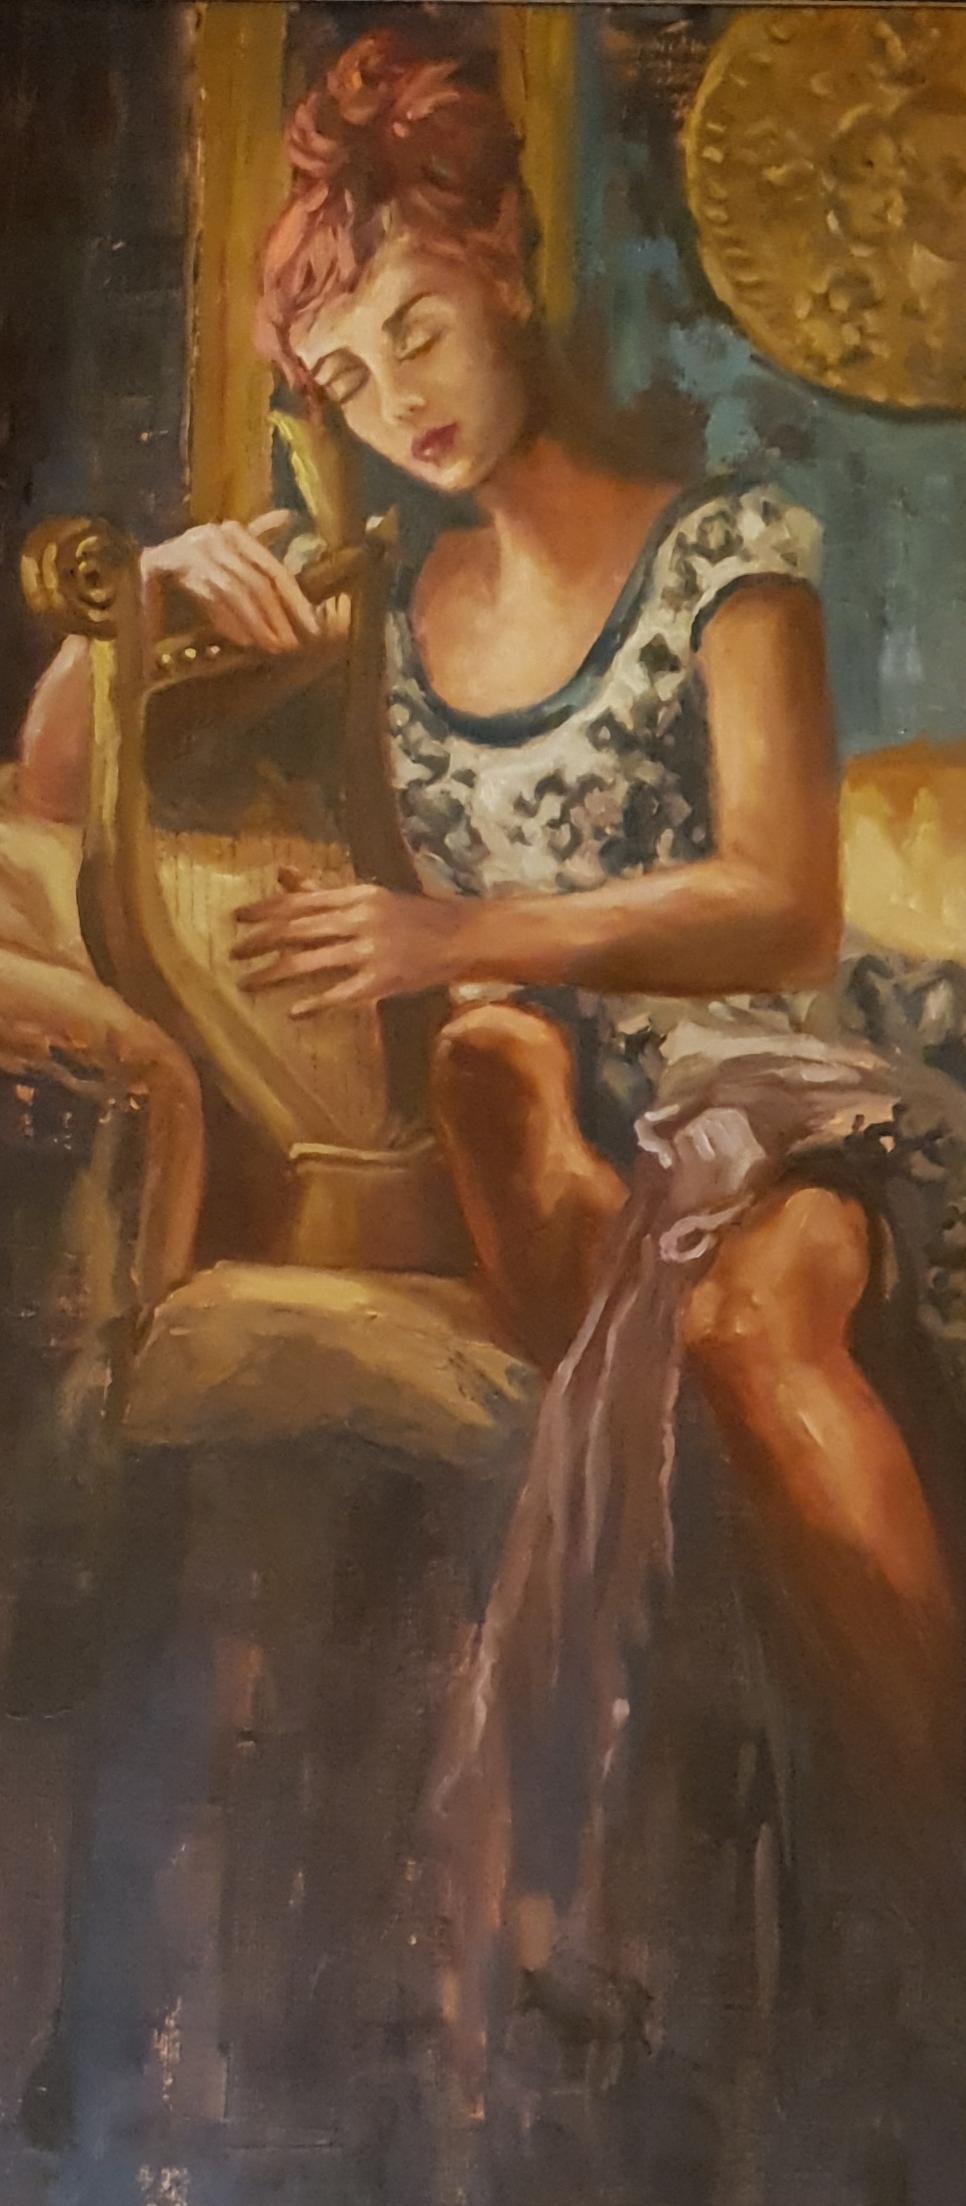 tanya lady harp